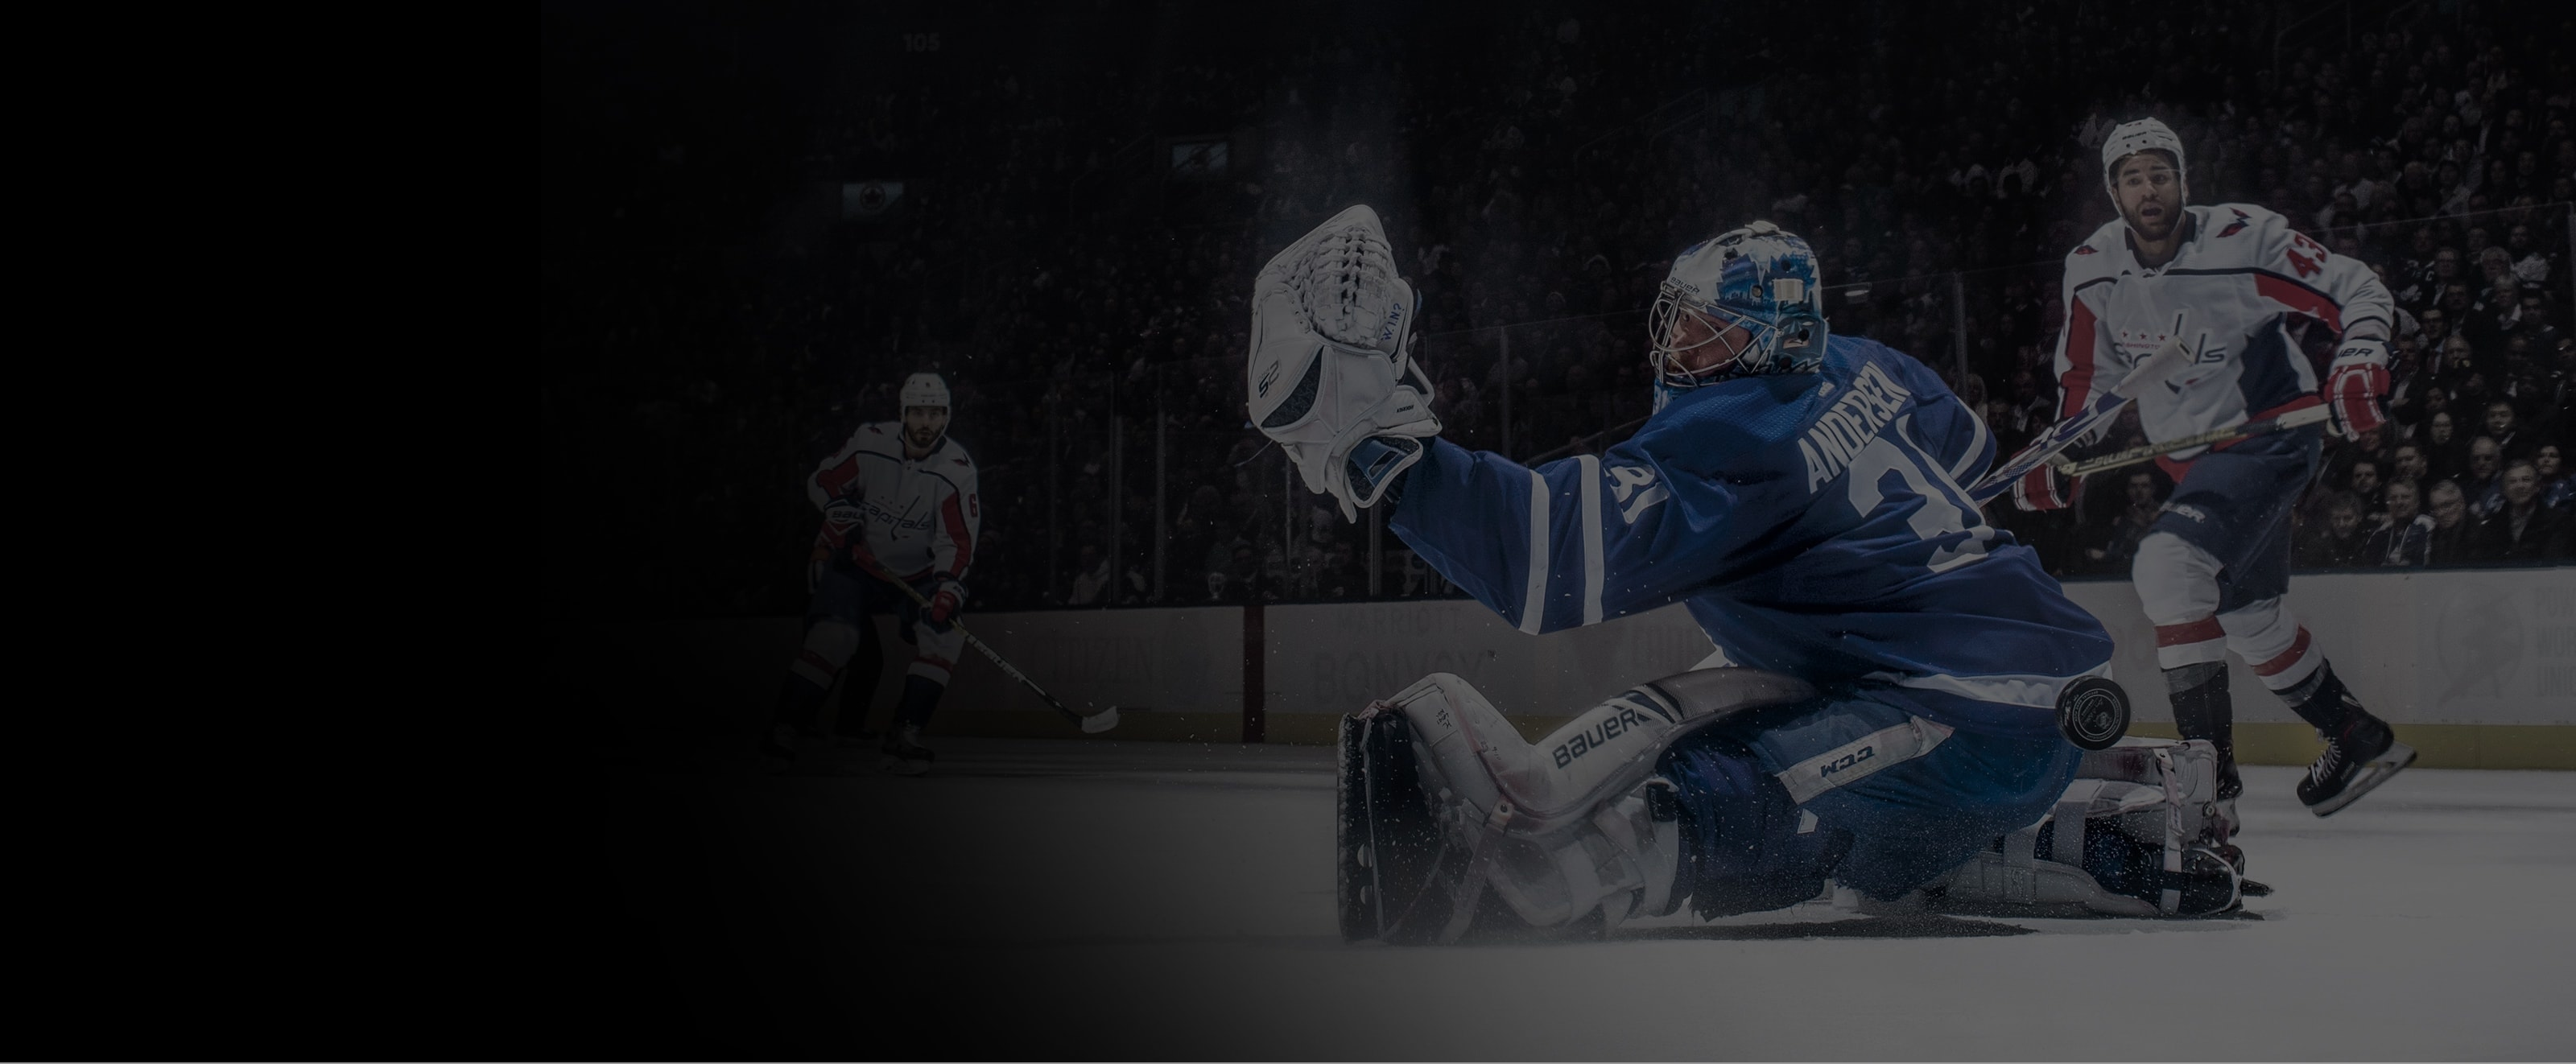 Stream NHL Games on Hulu | Watch Live Sports Online on Hulu